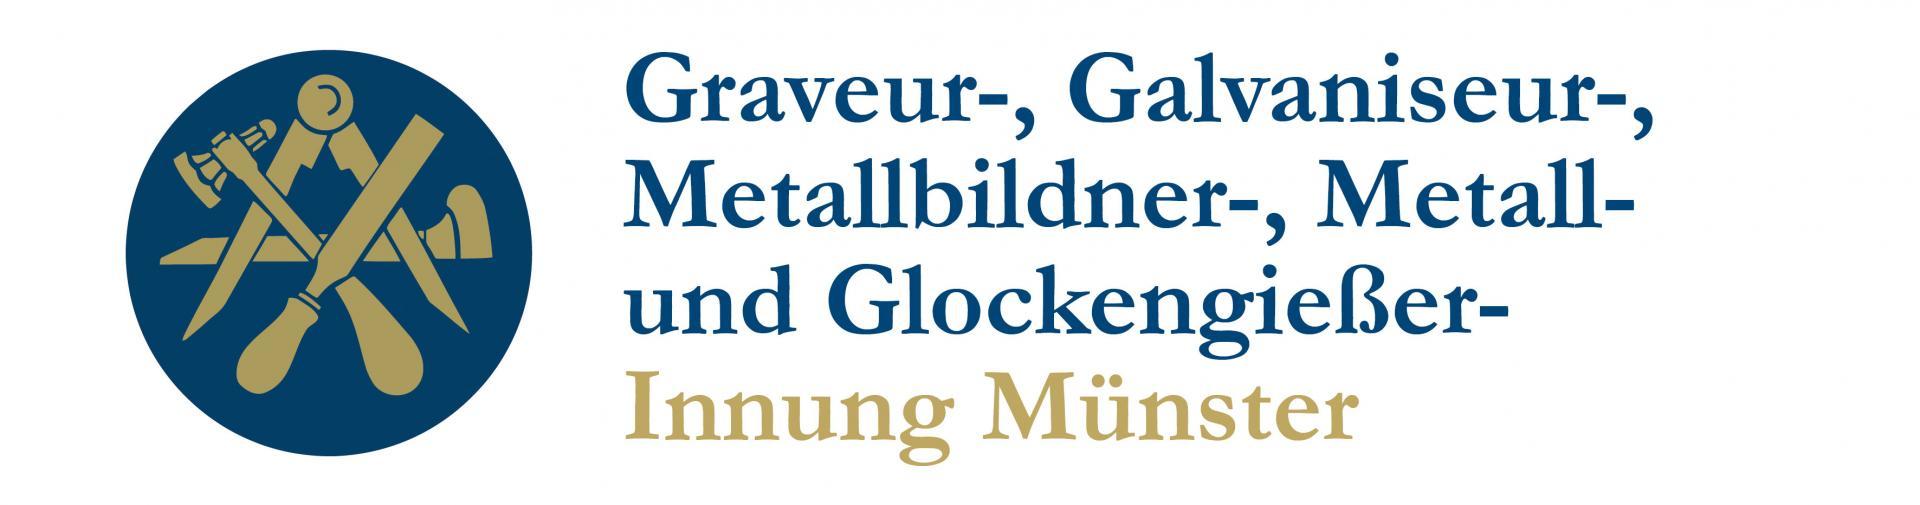 Graveur‐pp.‐Innung Münster